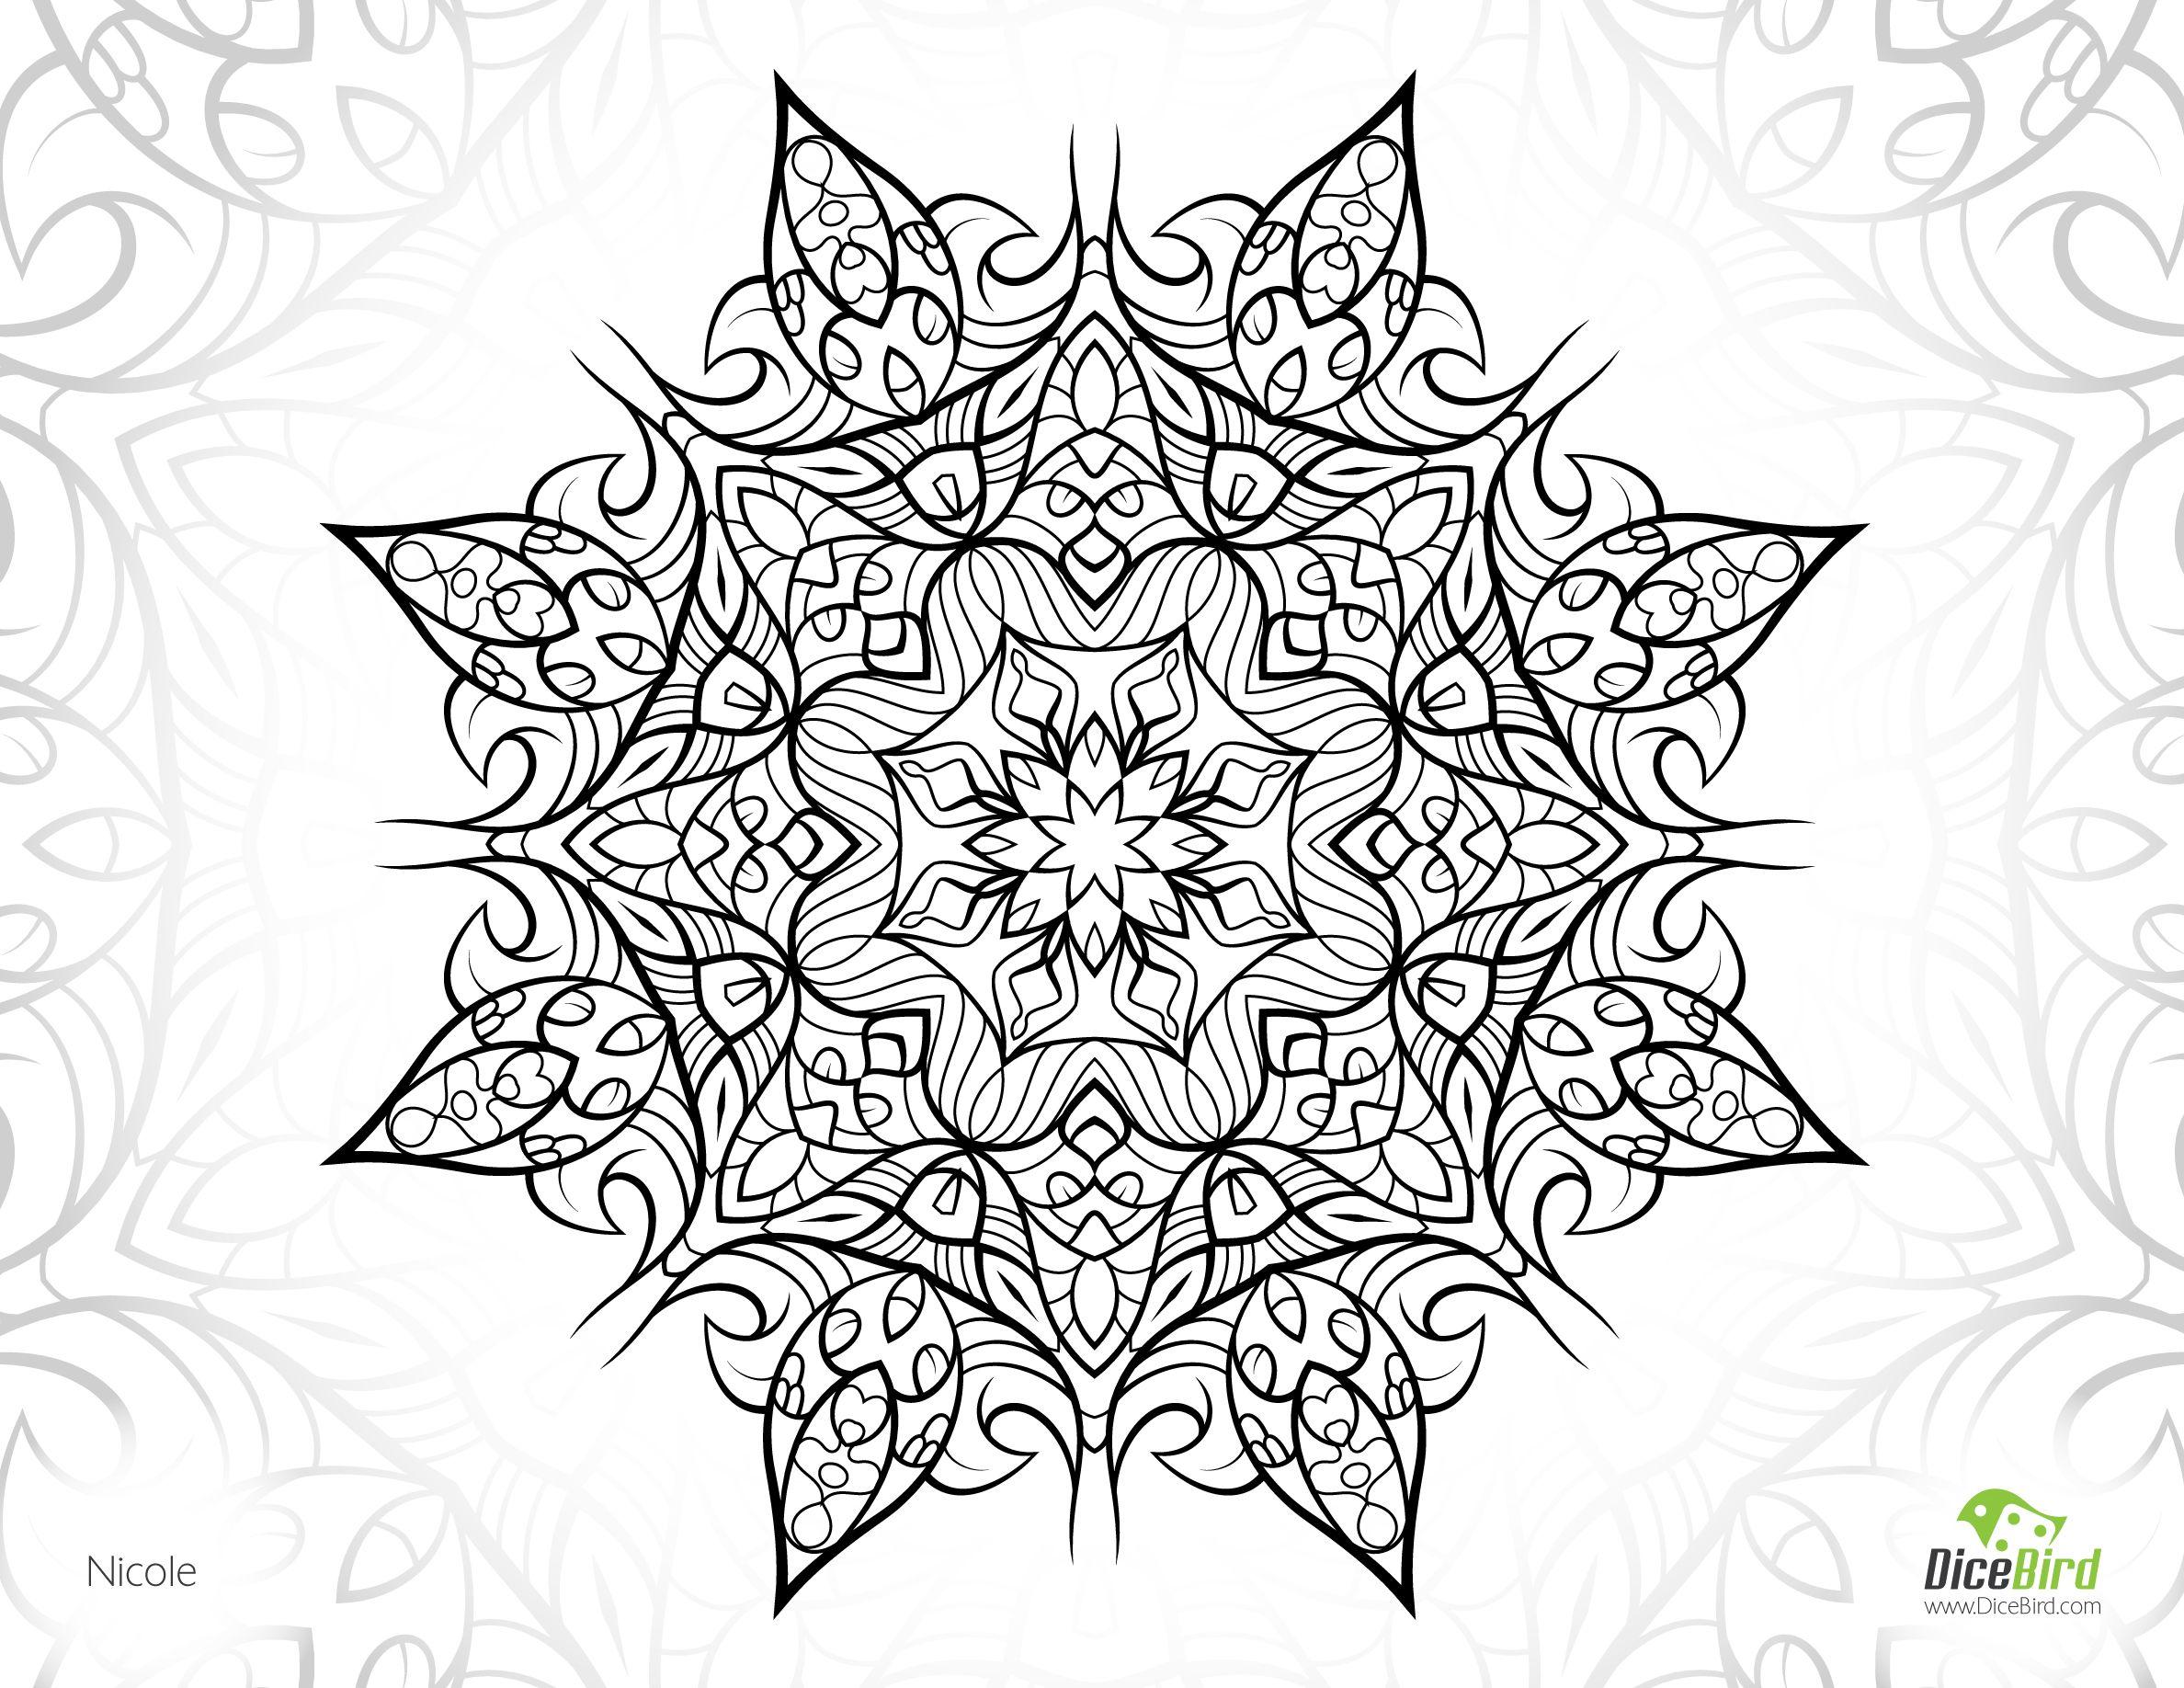 Nicole Flower Free Printable Plex Coloring Pages Printable